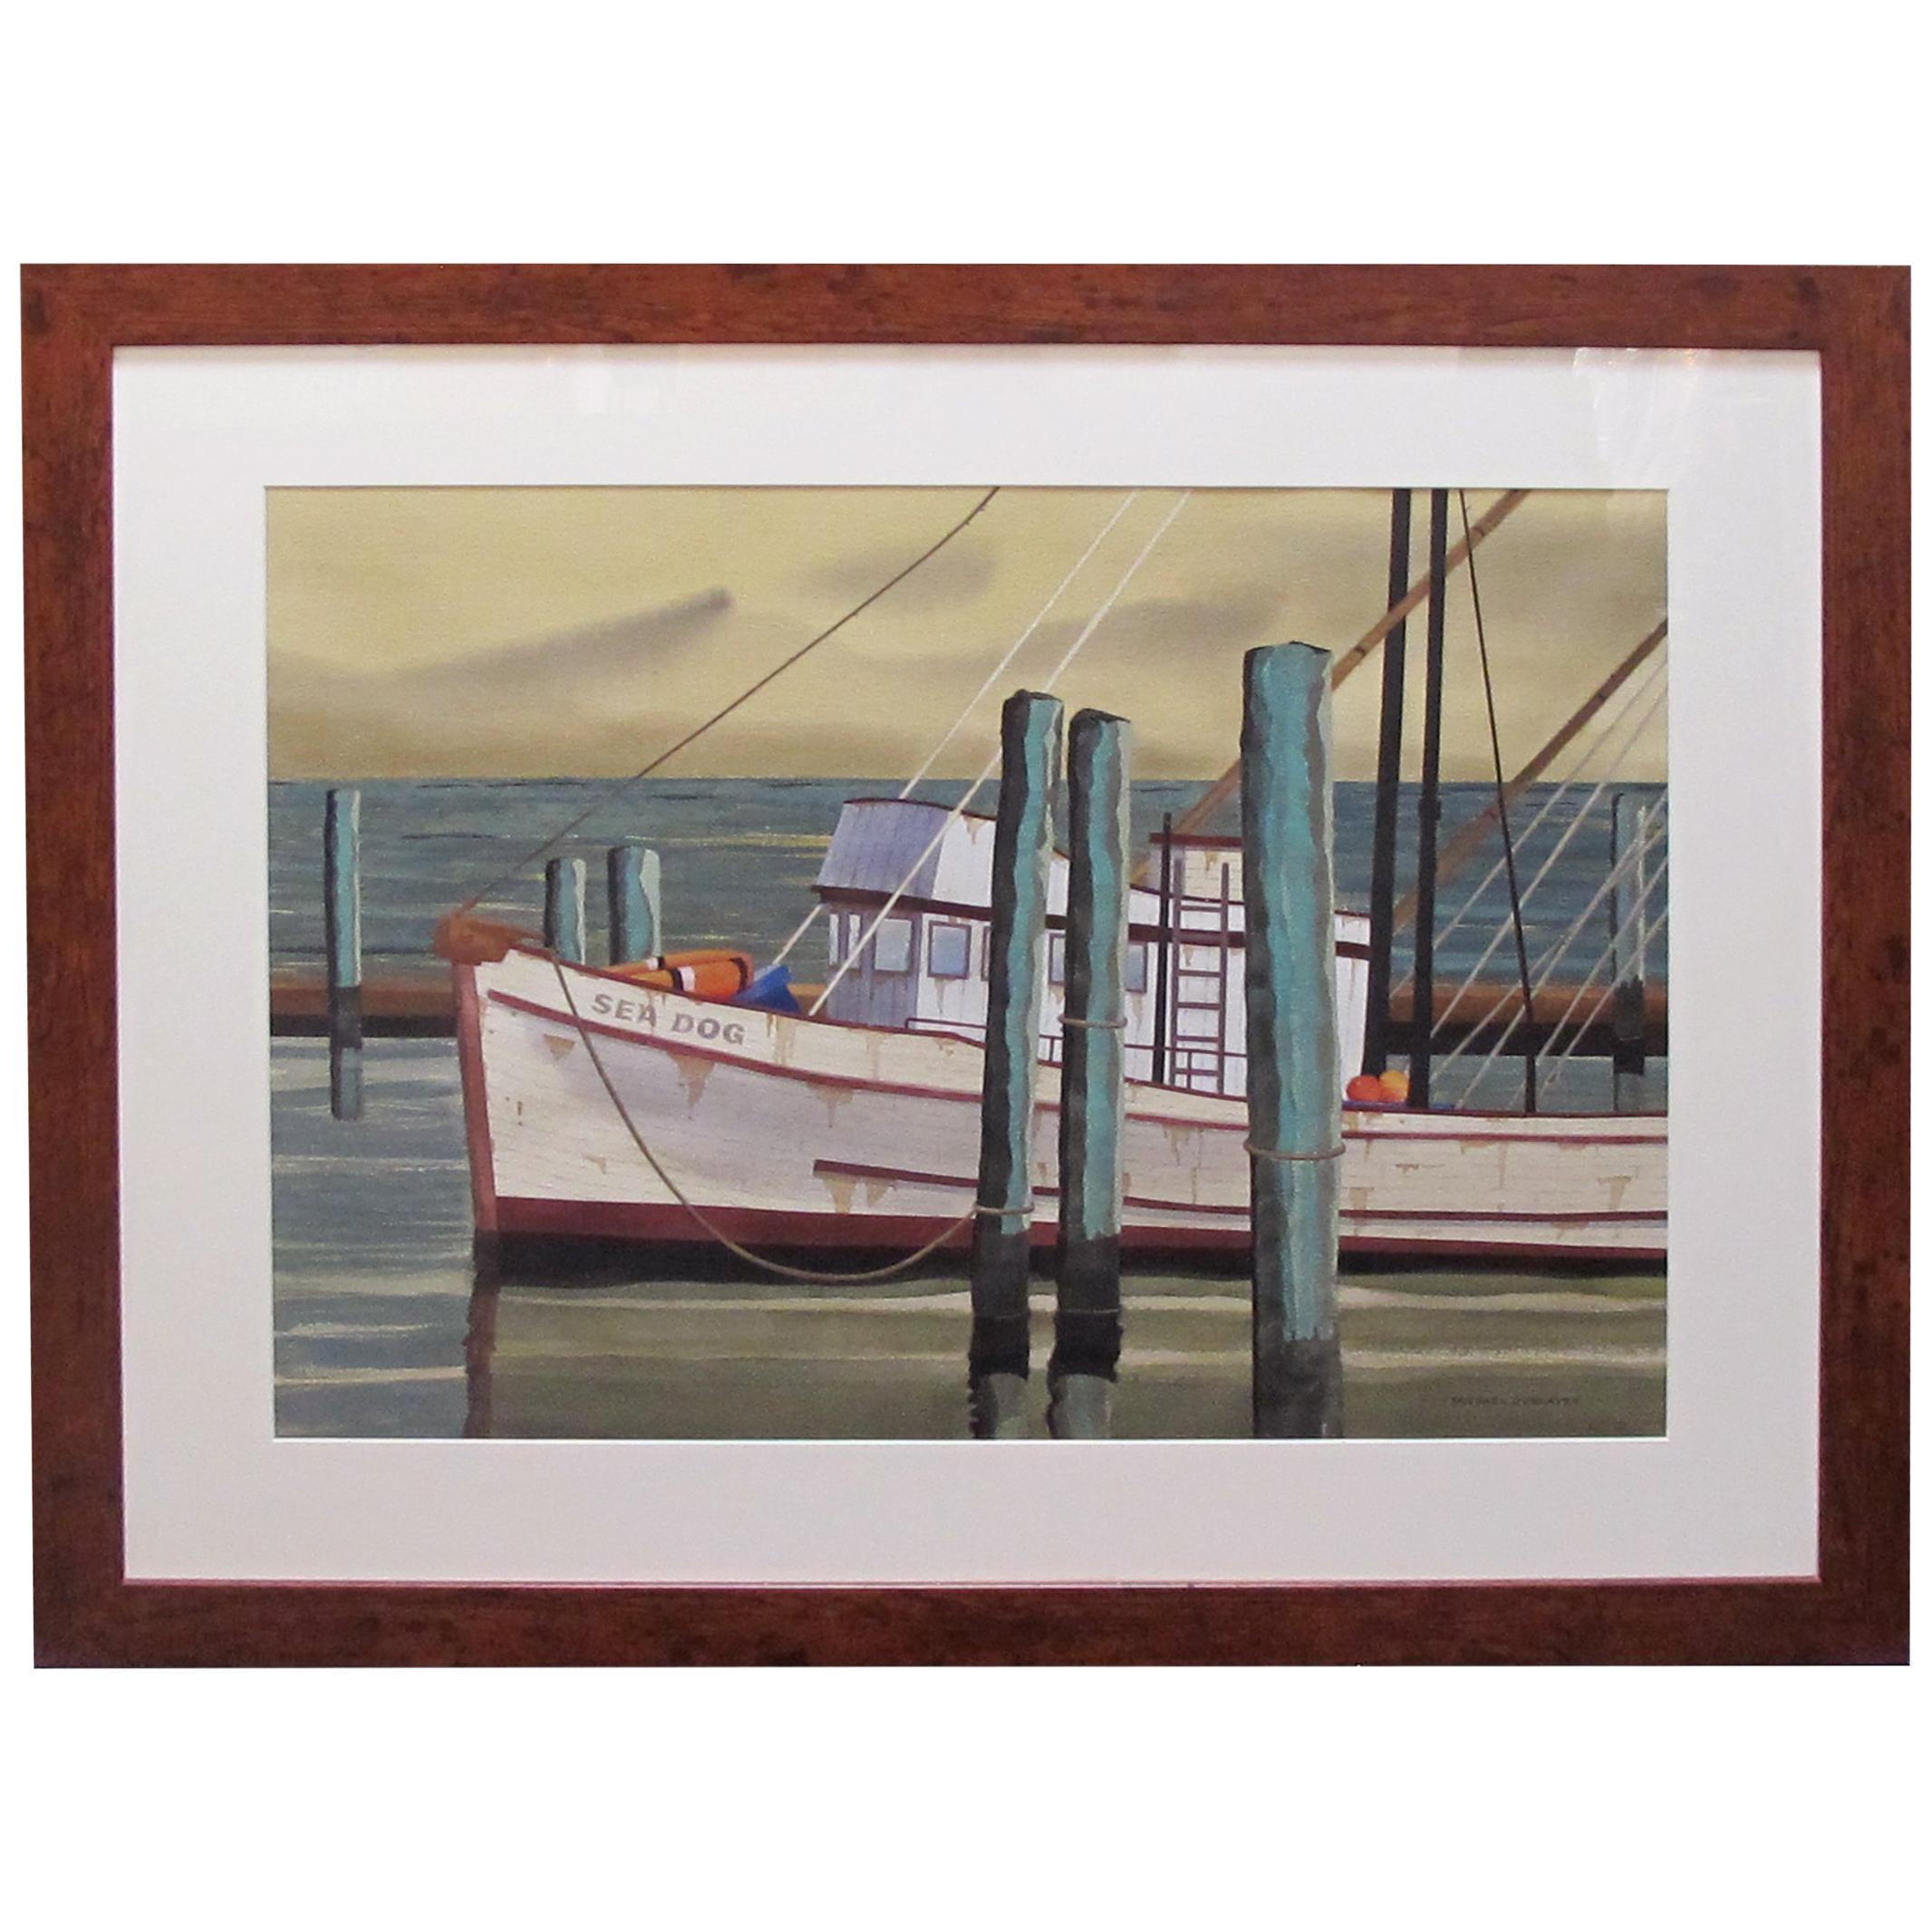 Watercolor on Paper 'Sea Dog, Santa Barbara, California' Signed Michael Dunlavey